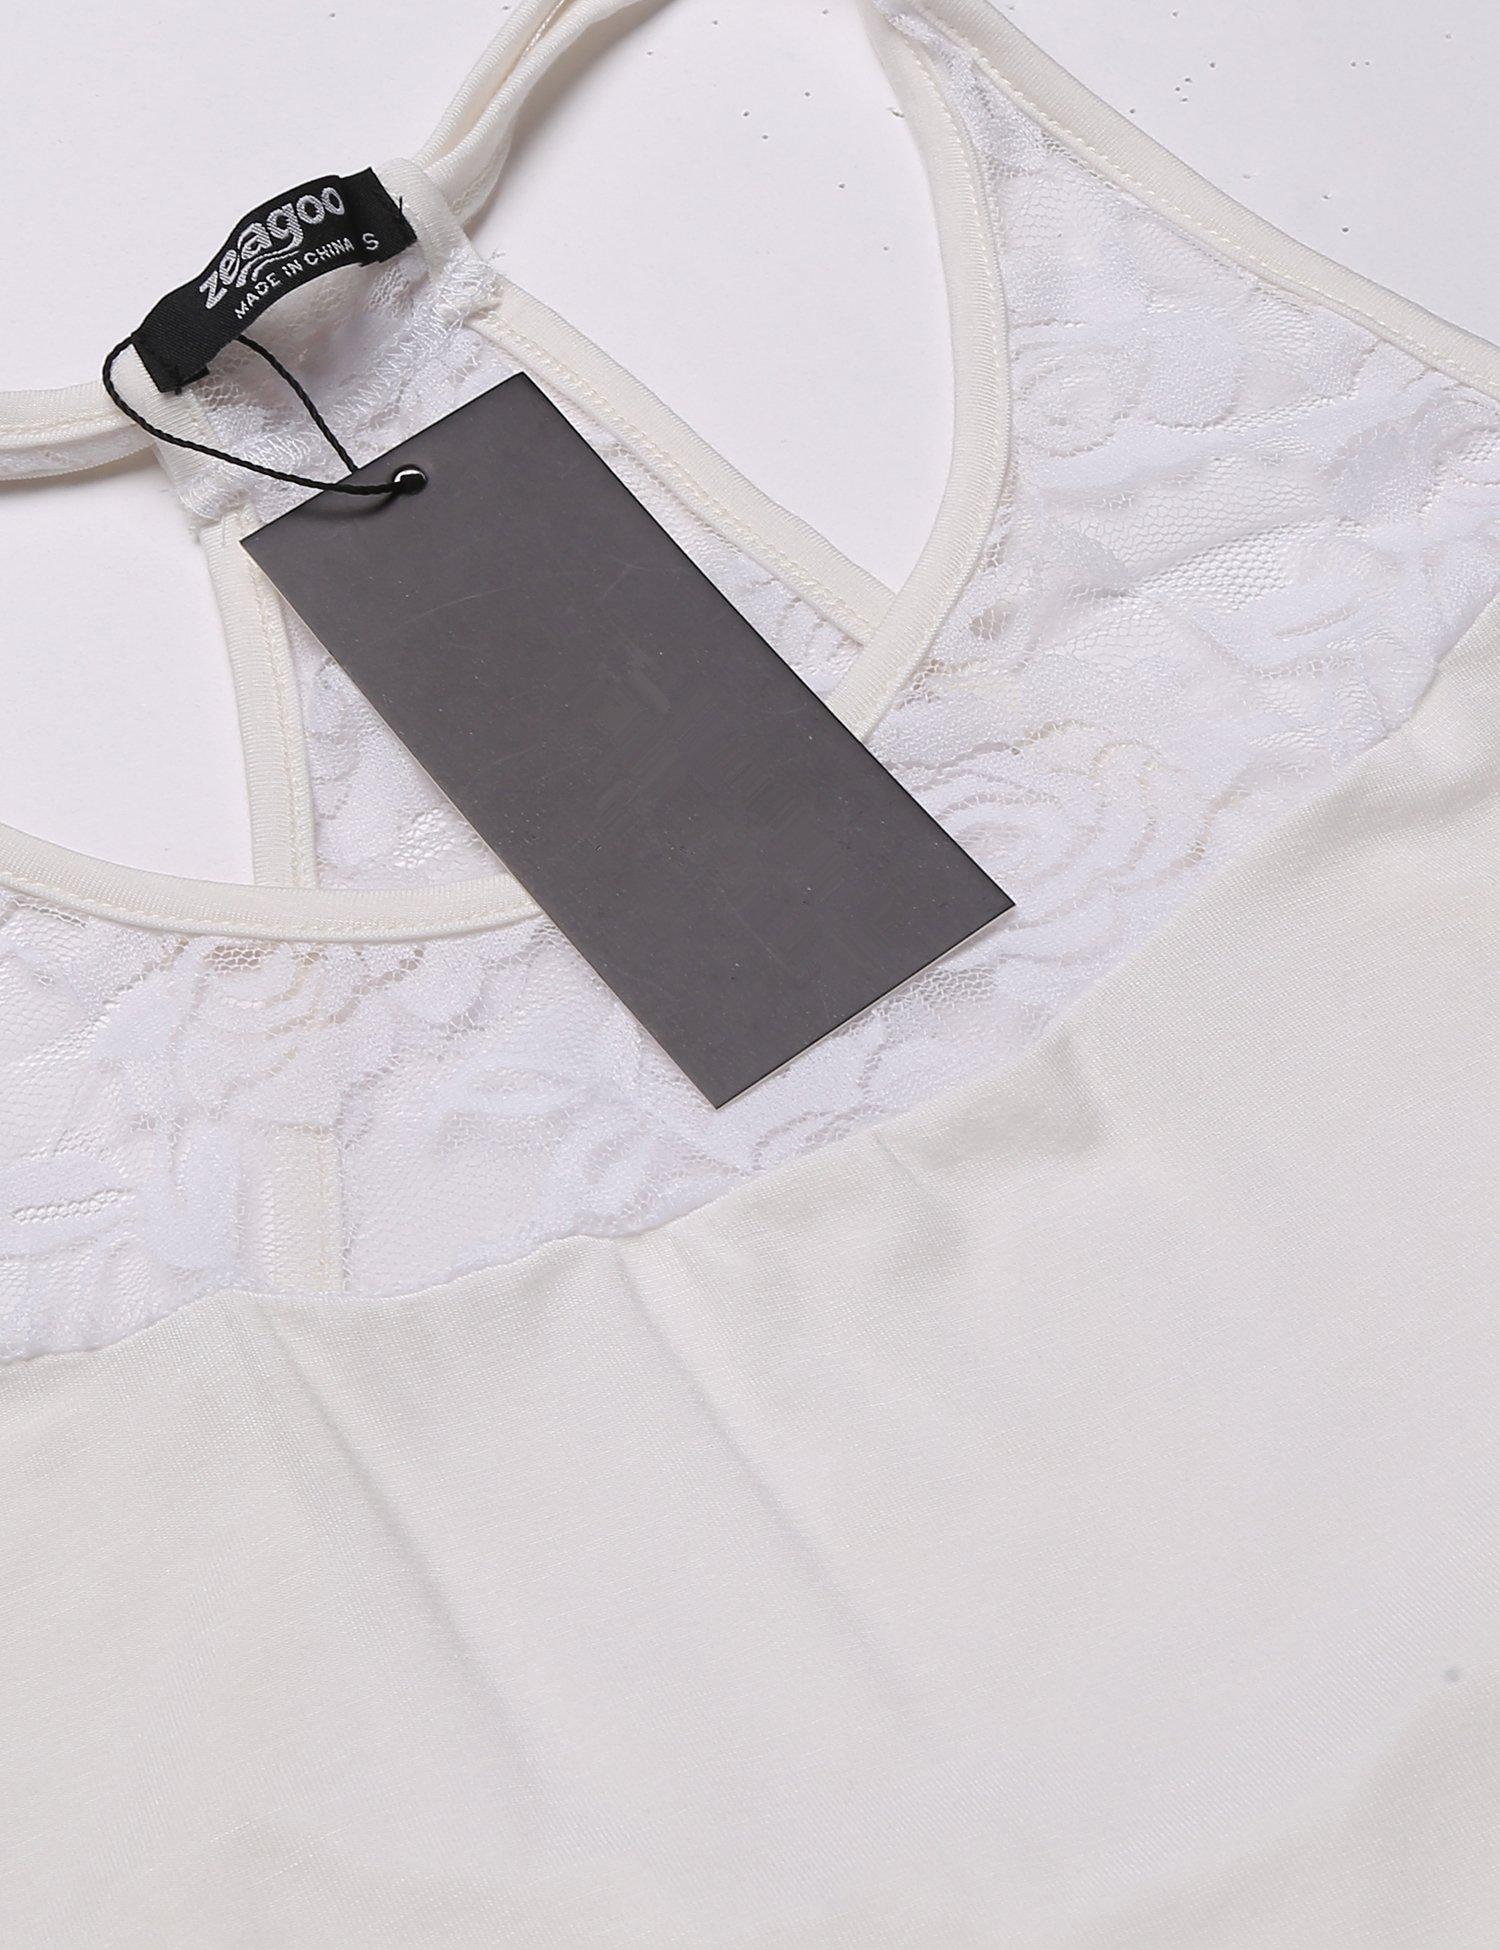 Mofavor Women's Sleeveless Crochet Lace Camisole Vest Halter Racerback Tank Top,White,Large by Mofavor (Image #5)